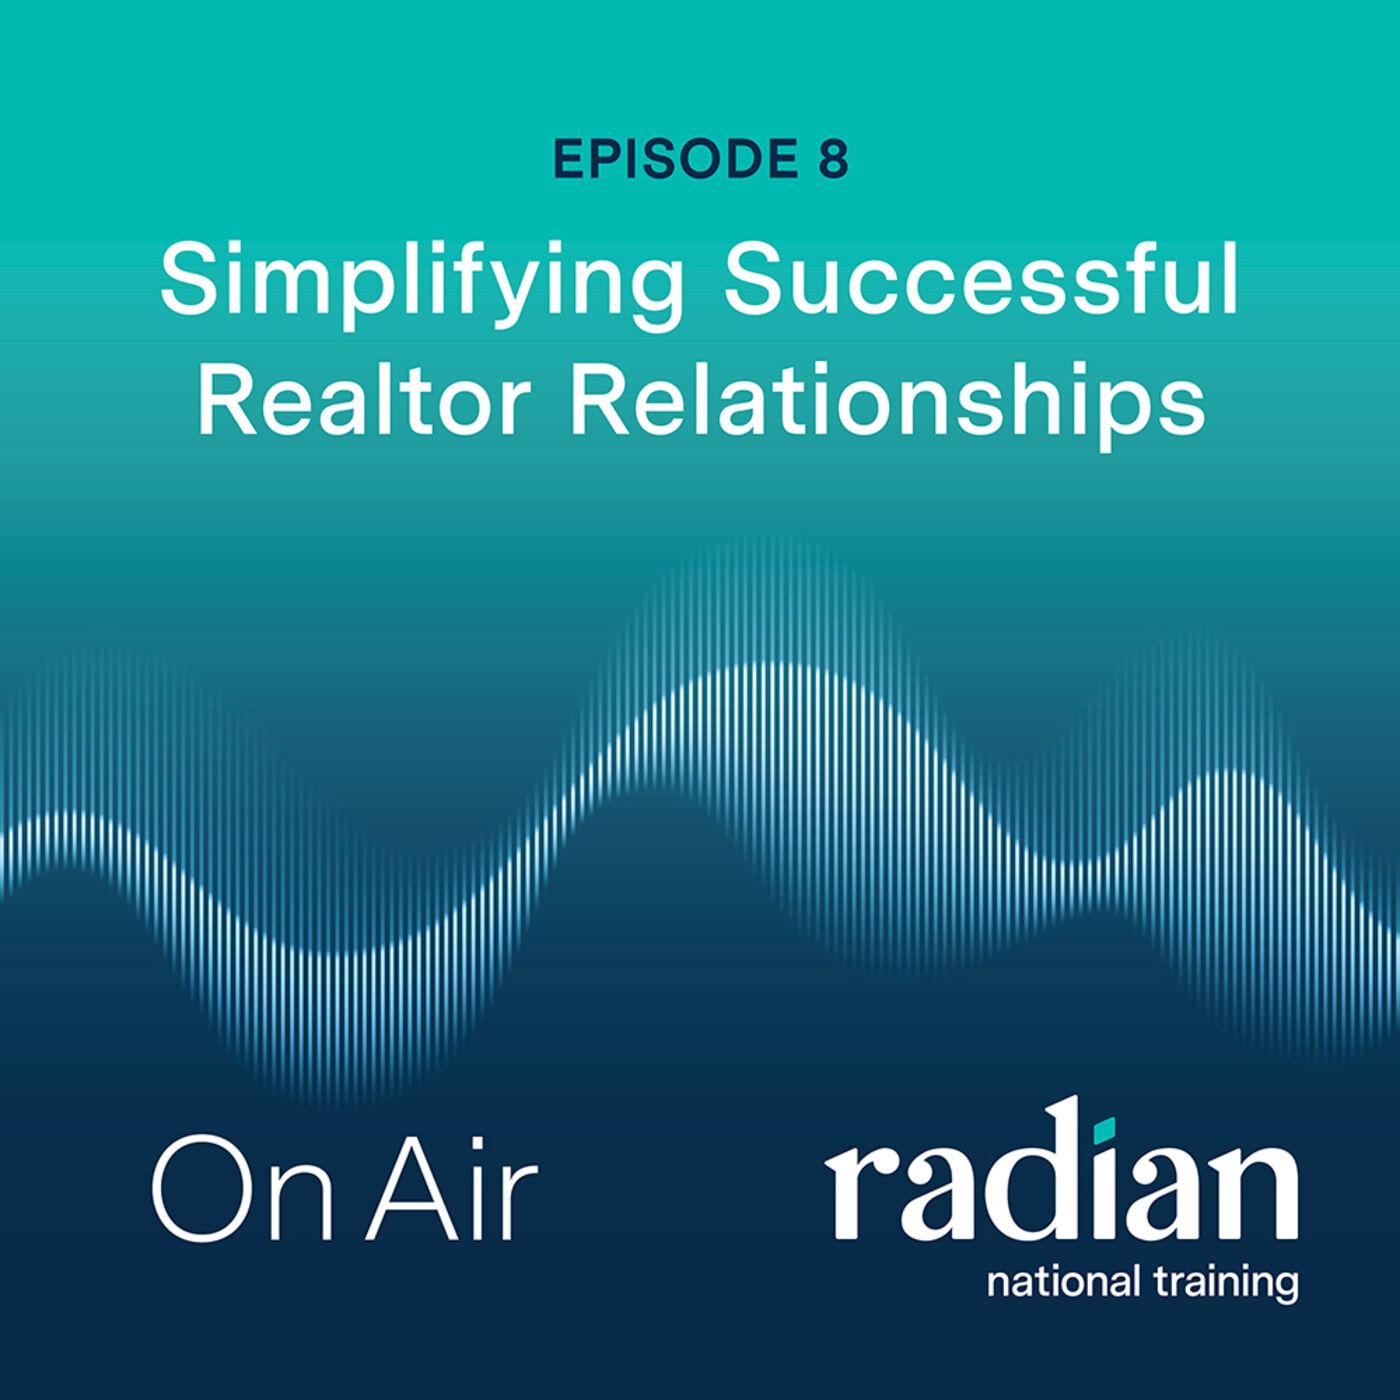 Simplifying Successful Realtor Relationships